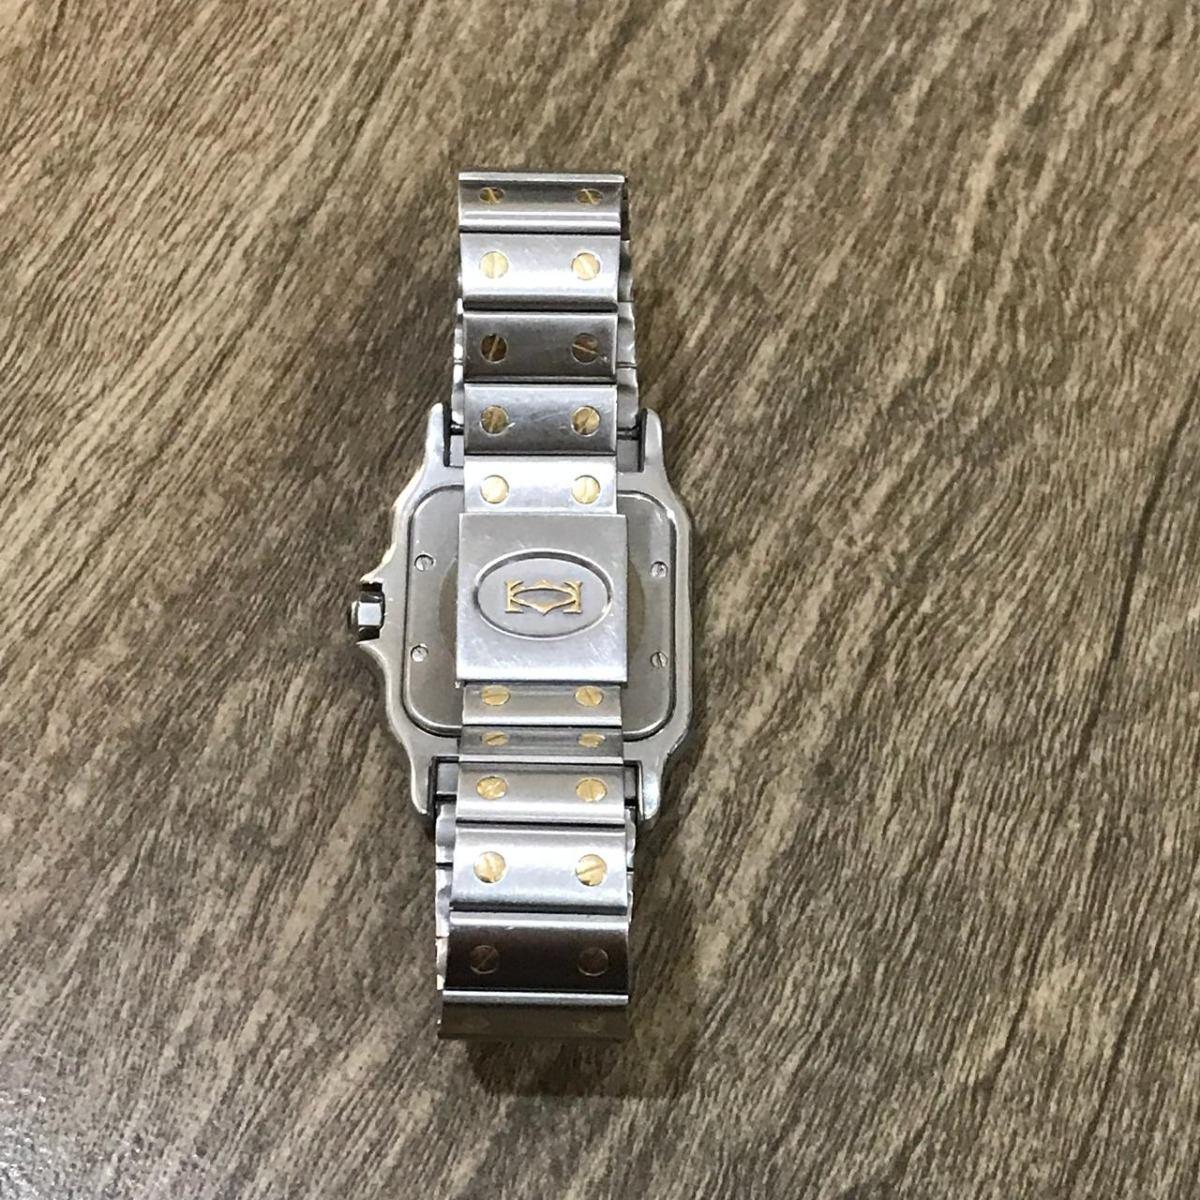 77ee9a6c799 relógio santos cartier aço e ouro 18k (case 29mml). Carregando zoom.